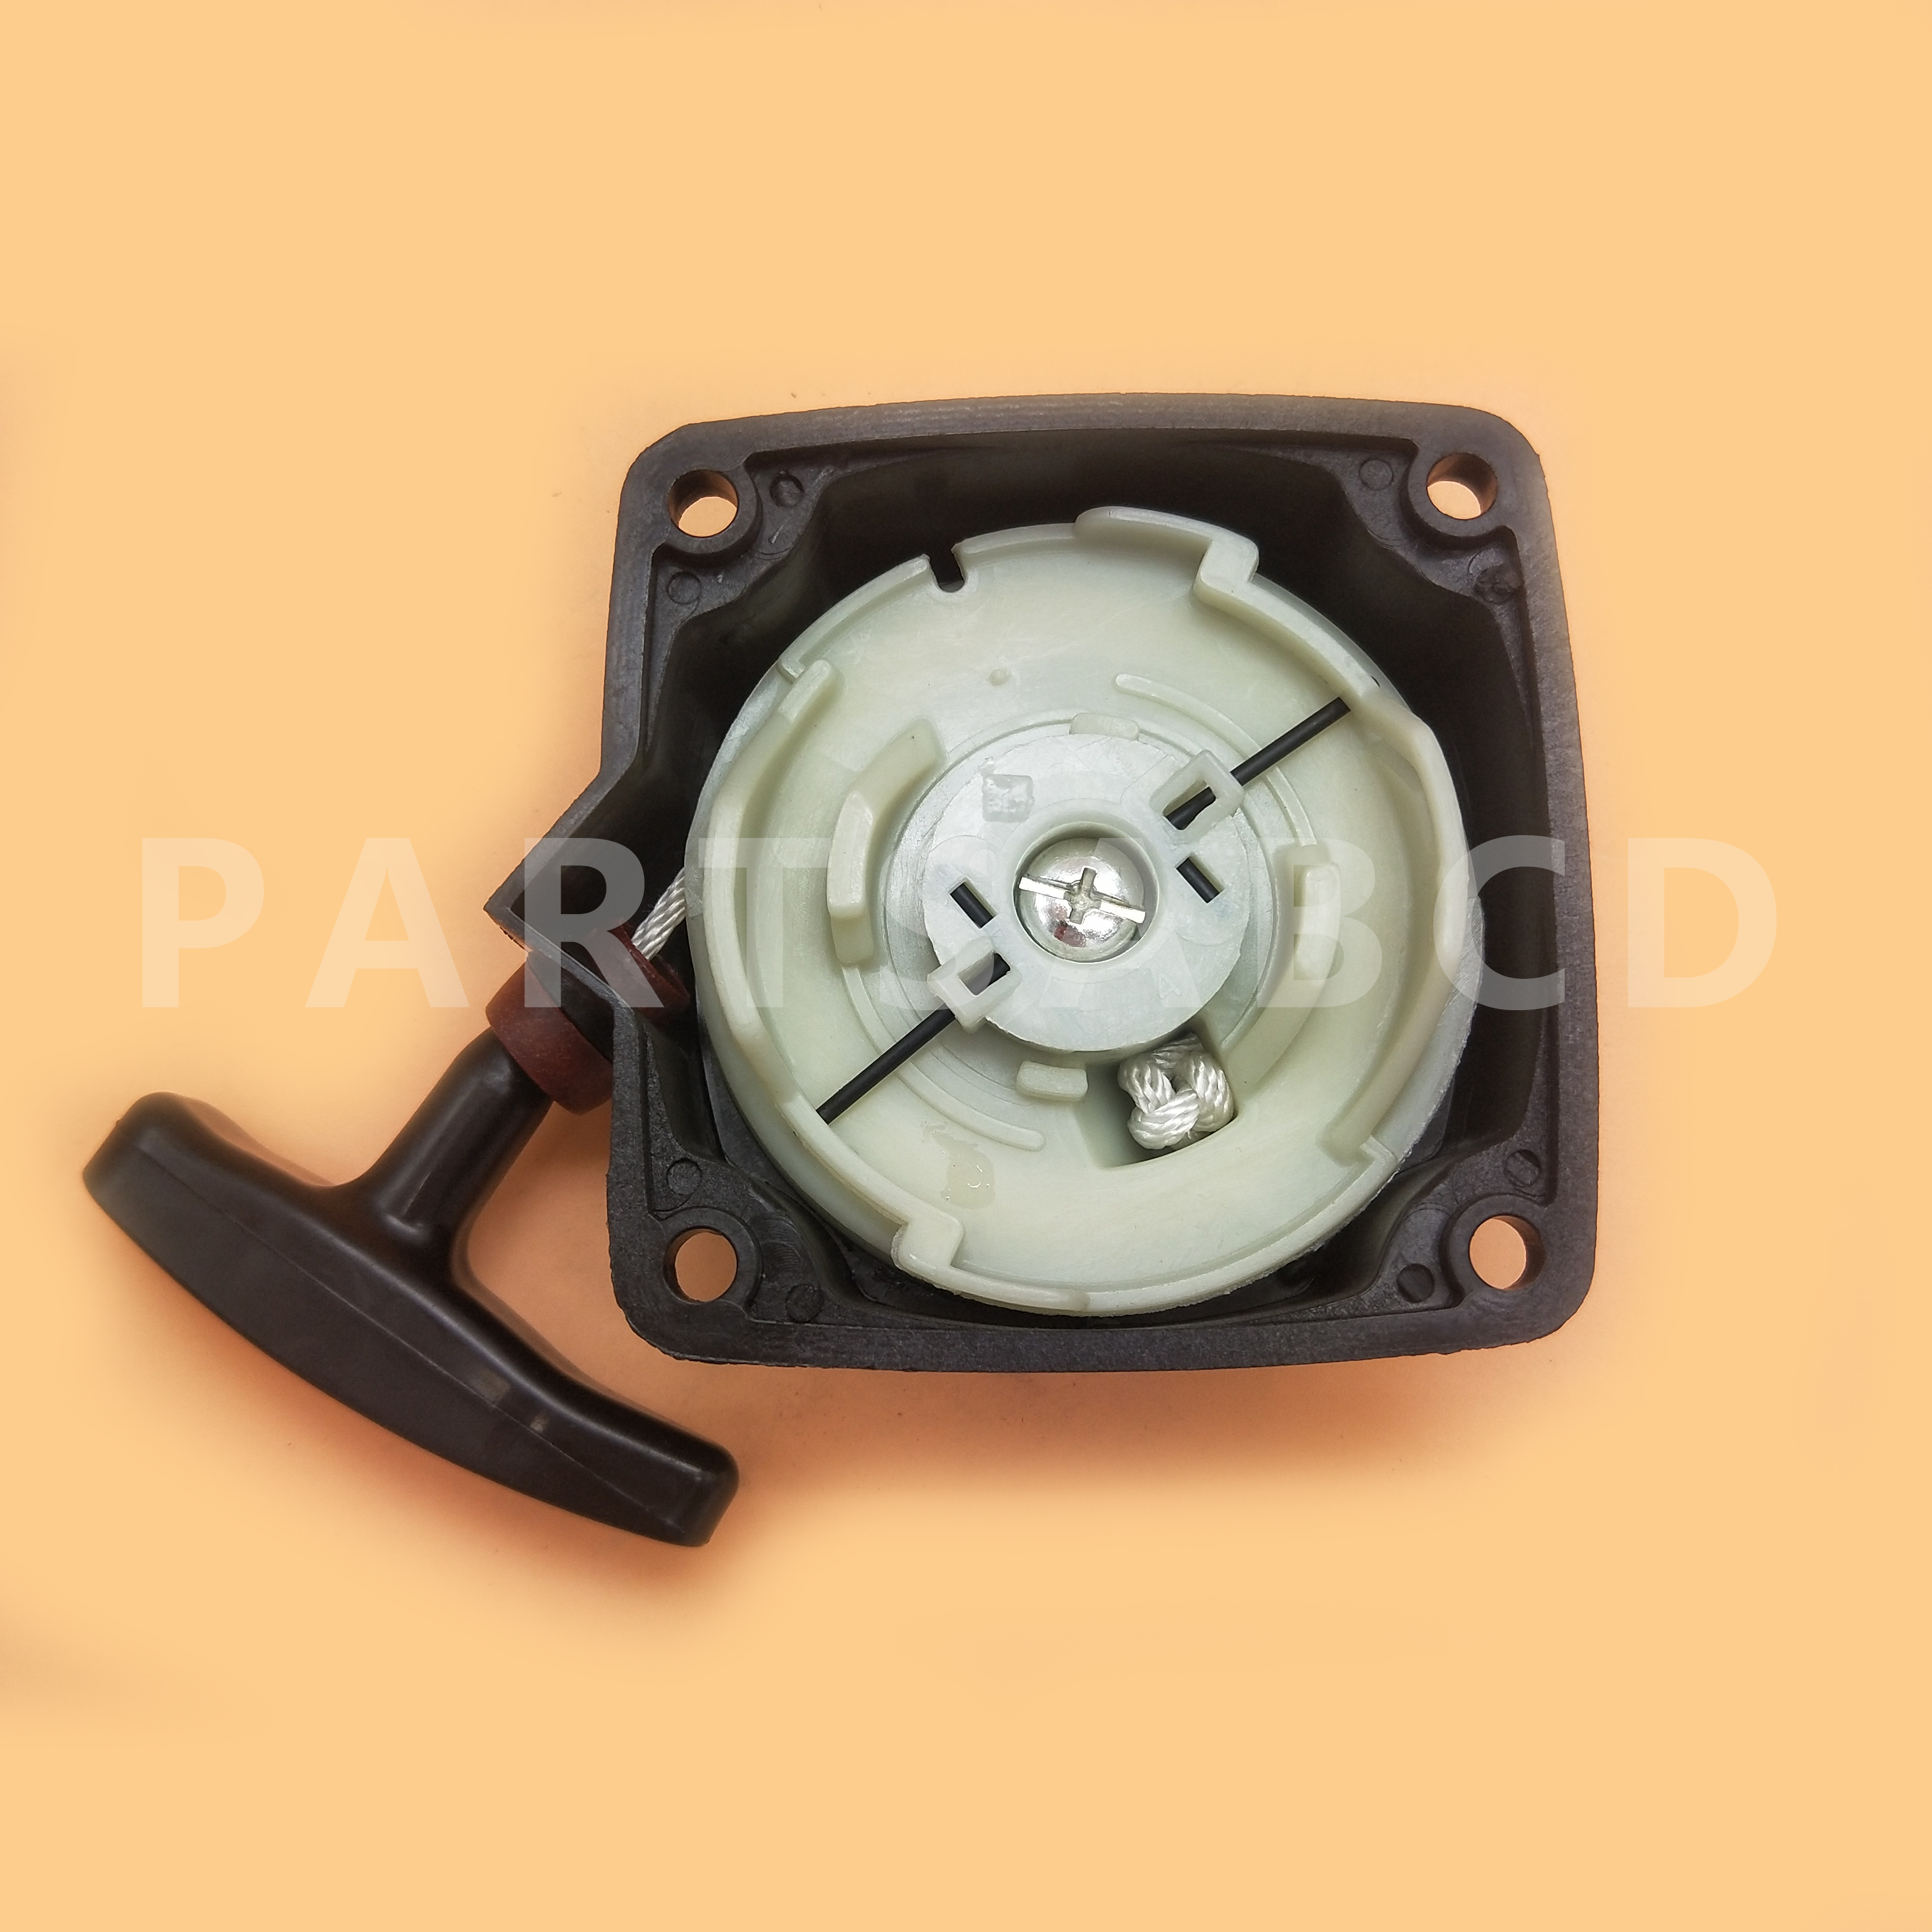 Pull Start Starter W// Pawl Plate For 47cc//49cc Engine Strimmer Lawnmower